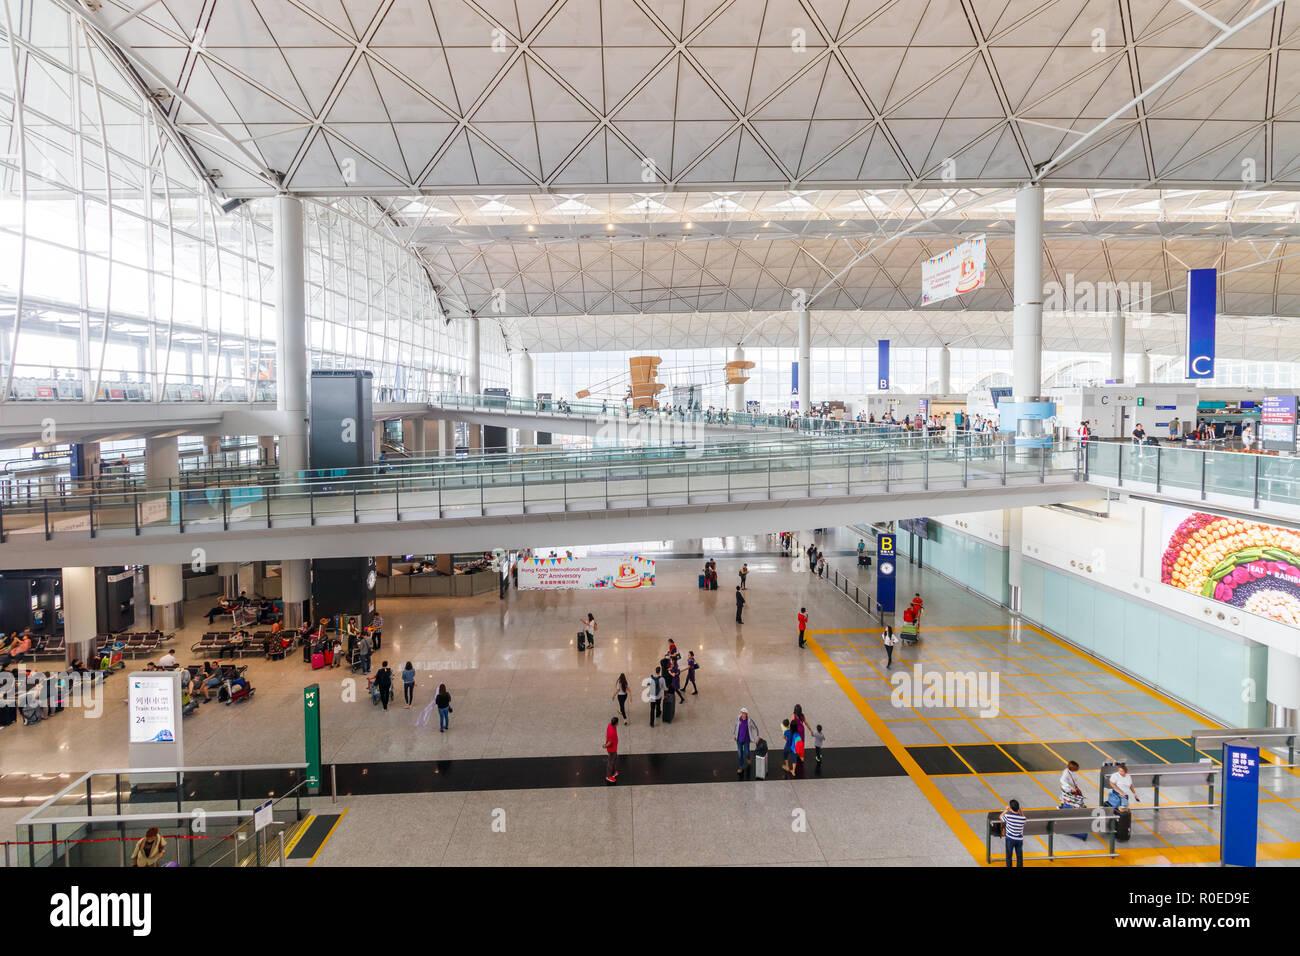 Inside Hong Kong International Airport - Stock Image